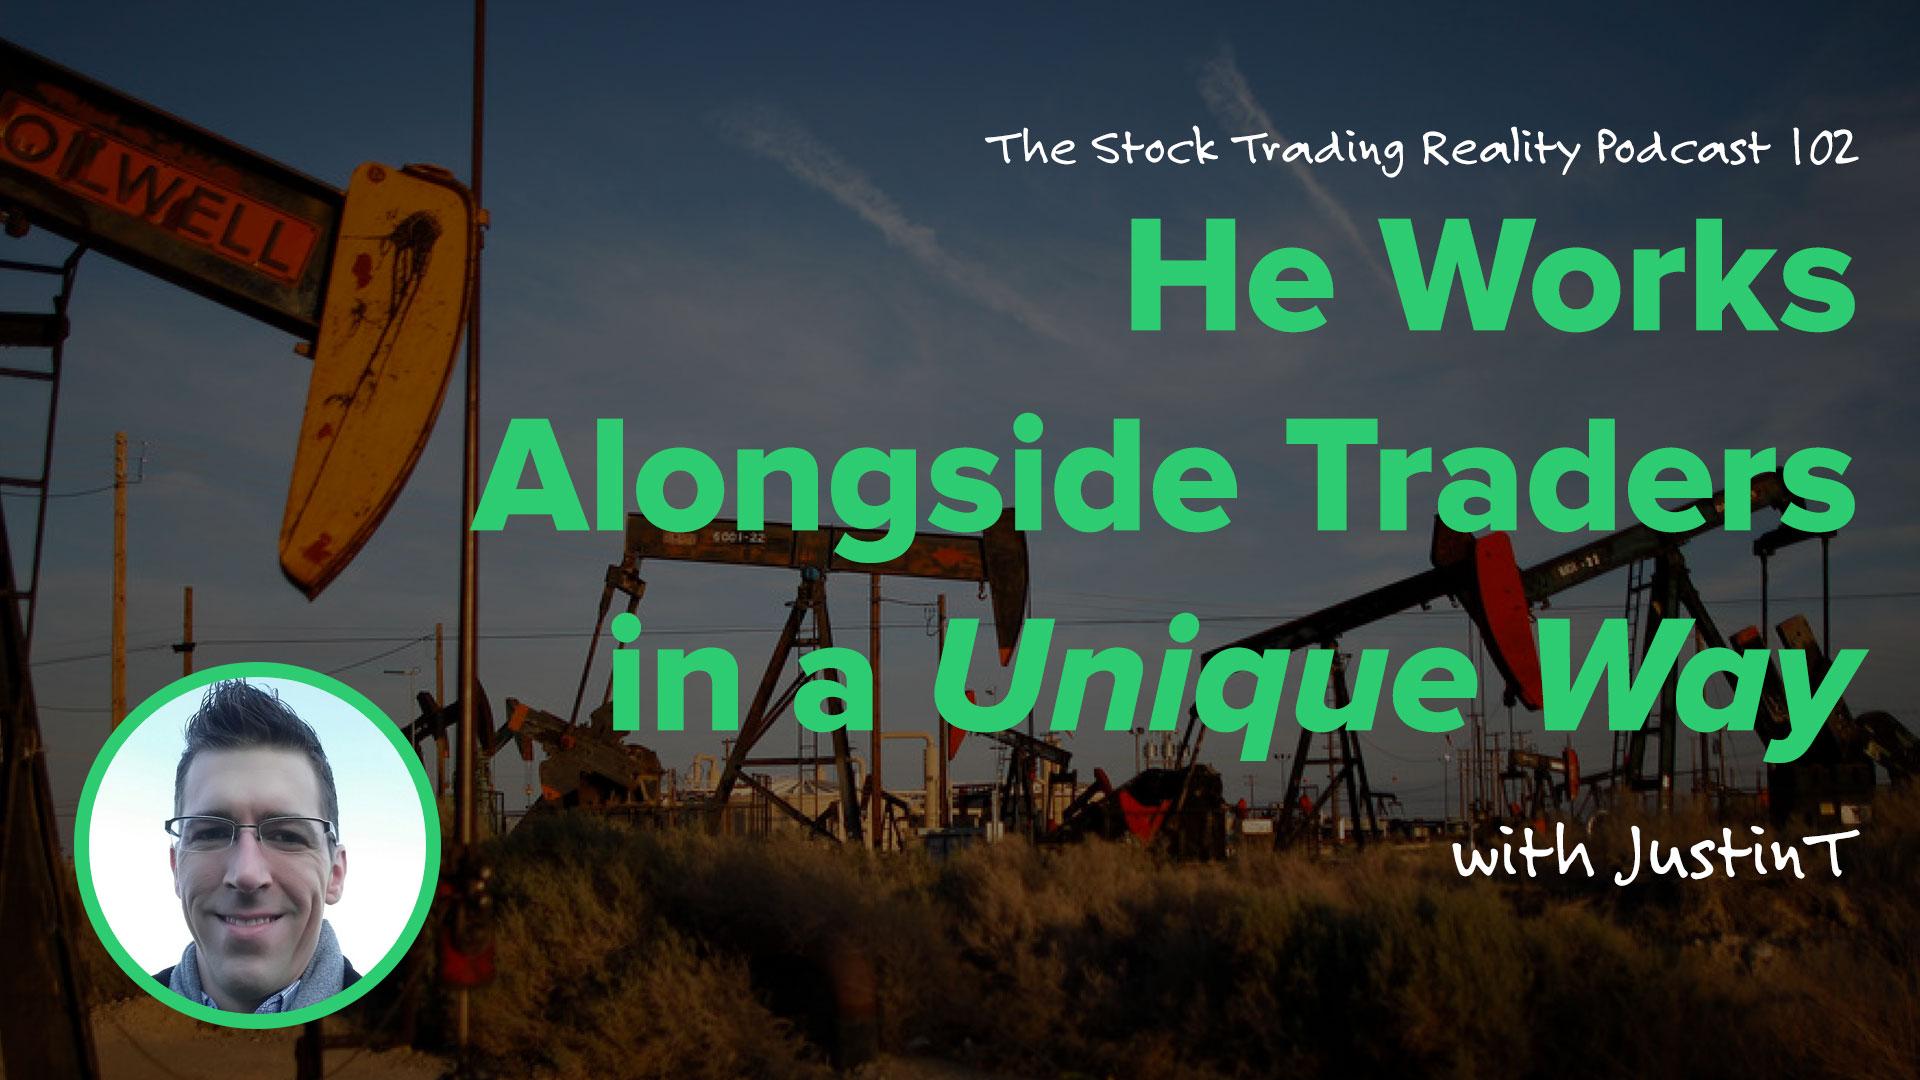 STR 102: He Works Alongside Traders in a Unique Way